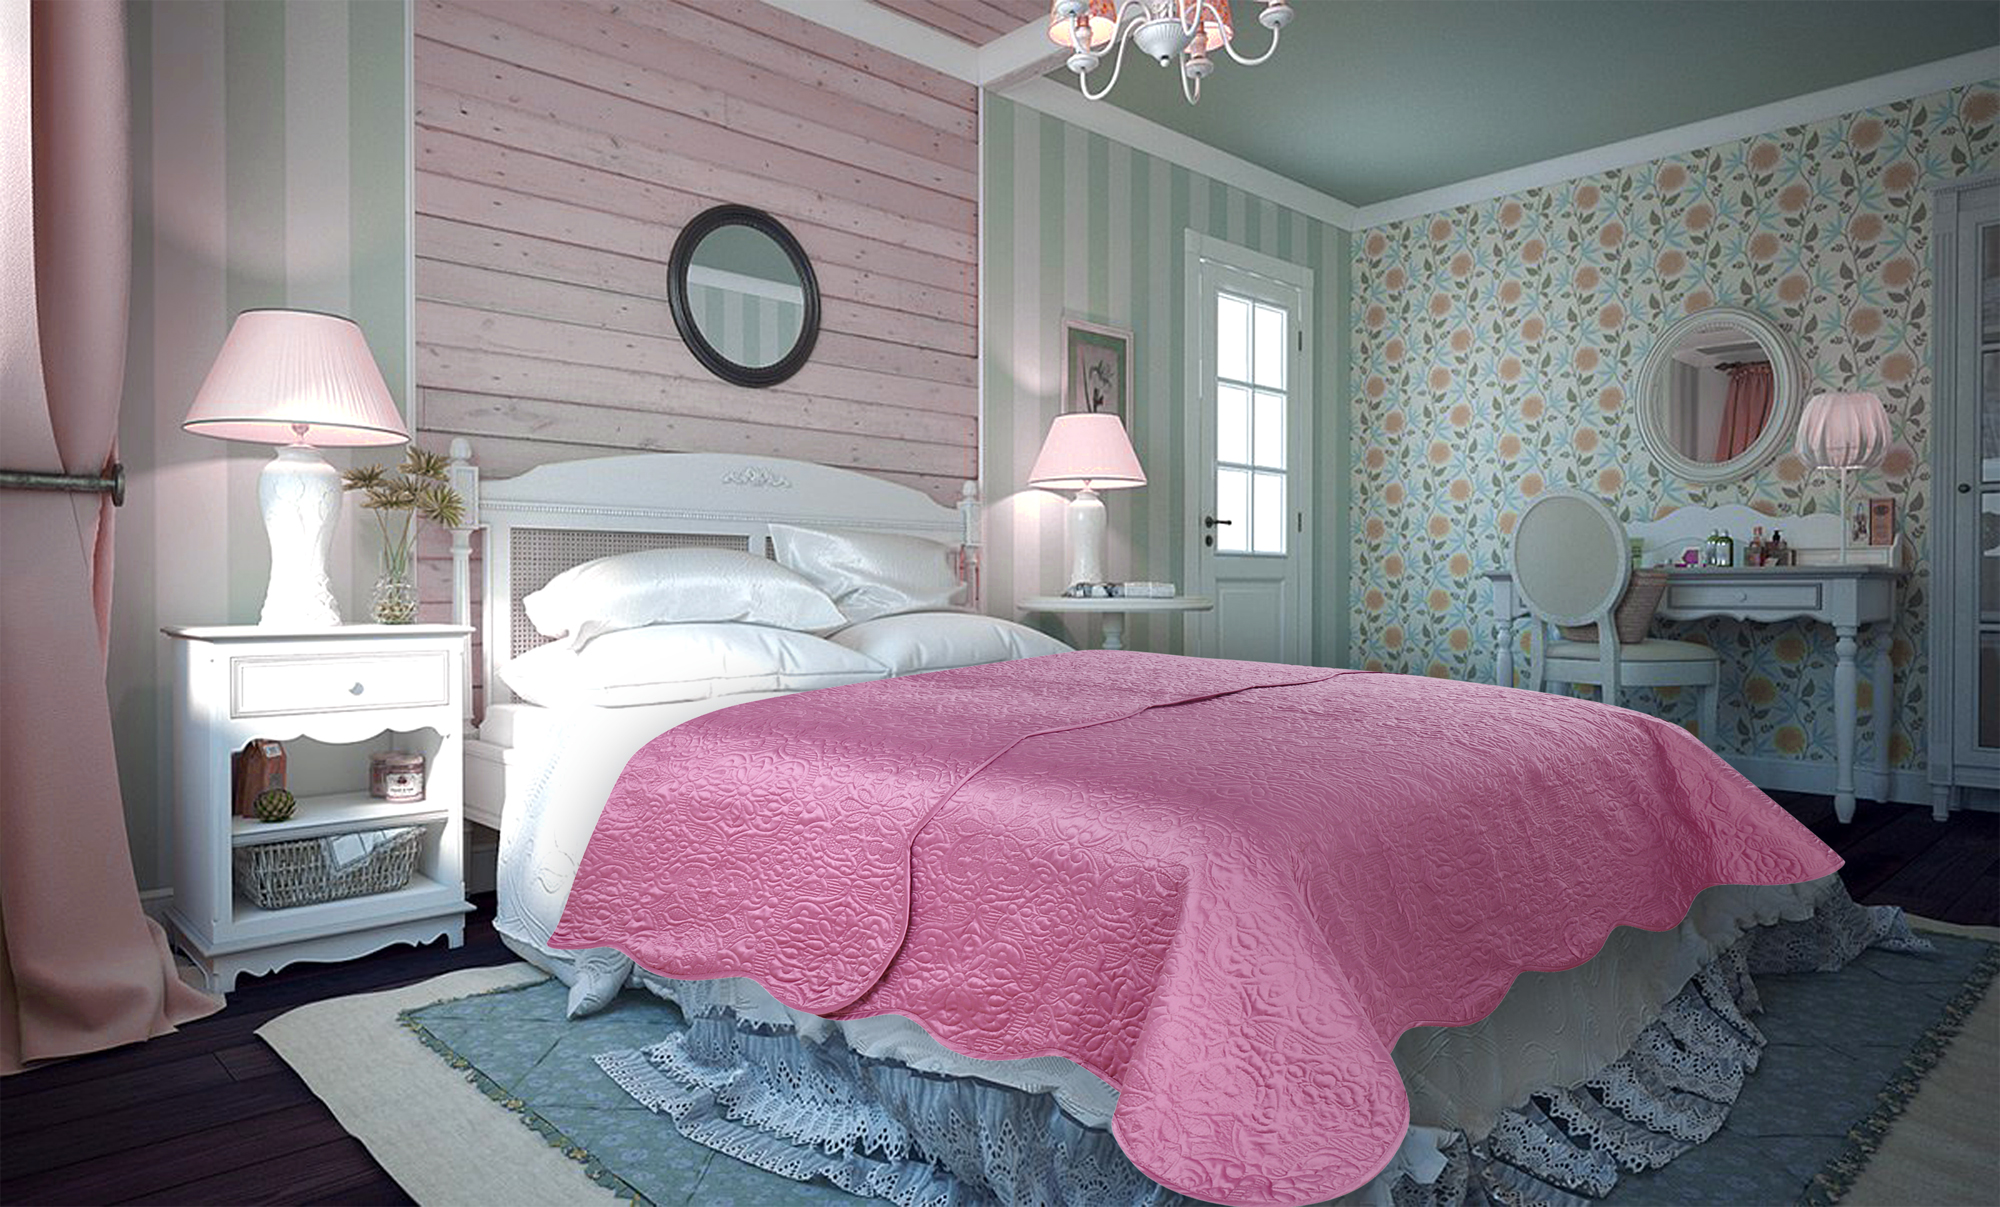 Купить Пледы и покрывала Amore Mio, Покрывало Trire (220х240 см), Китай, Синтетический сатин, Атлас